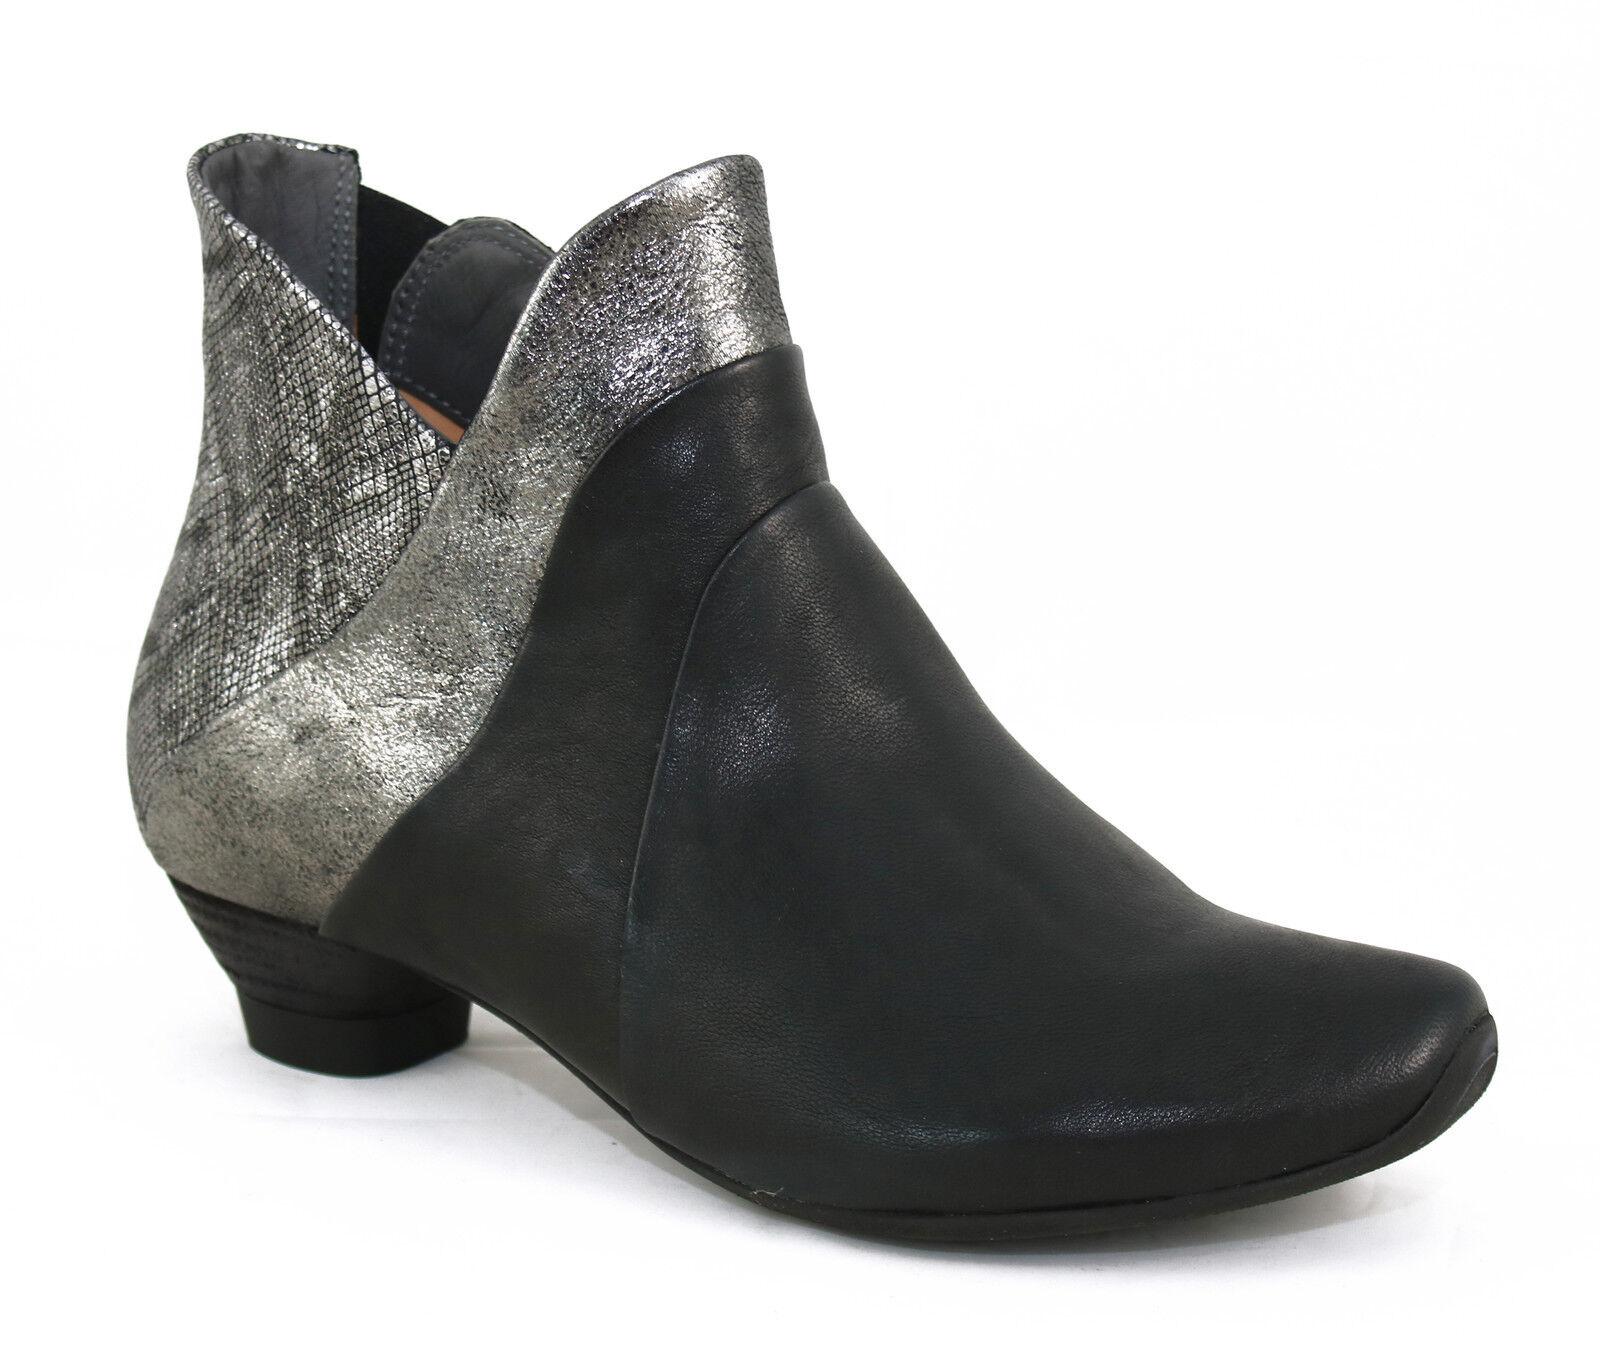 Grandes zapatos con descuento THINK! 87255 Damen Stiefelette AIDA  513